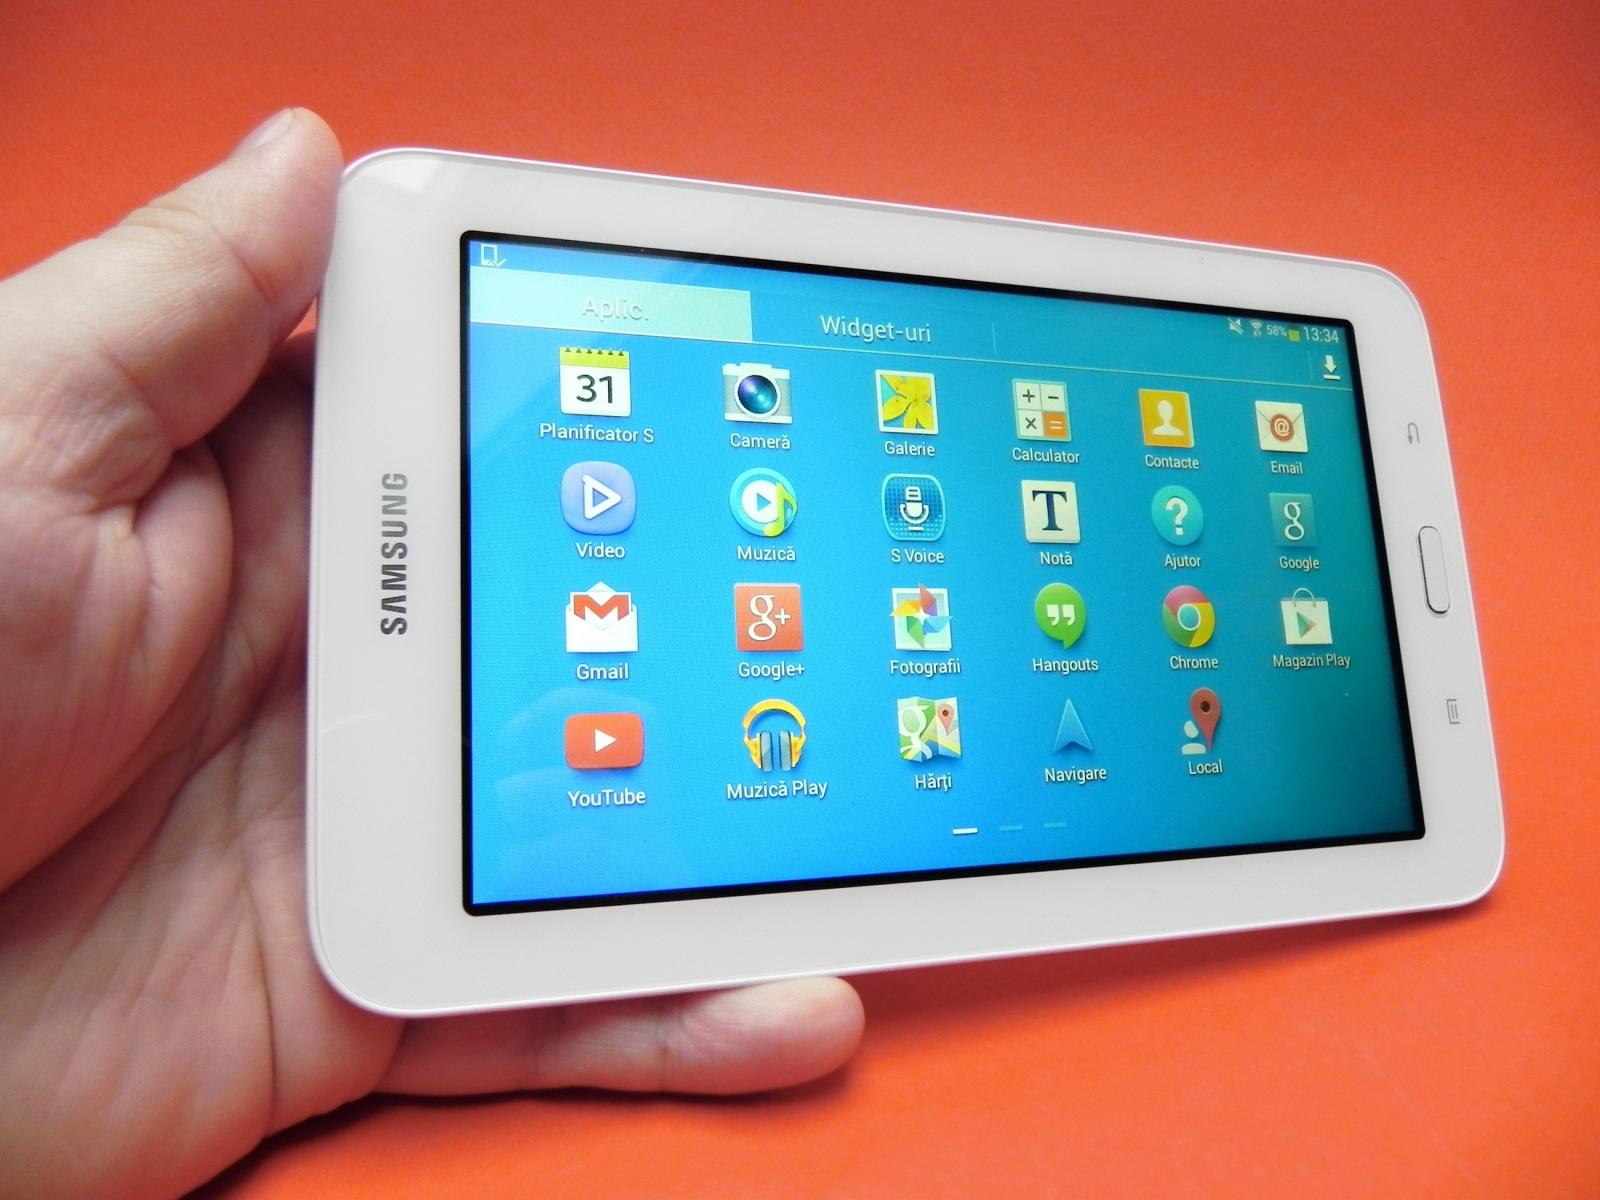 Samsung galaxy tab 3 lite 7 0 review cea mai accesibil for Photo ecran galaxy tab 3